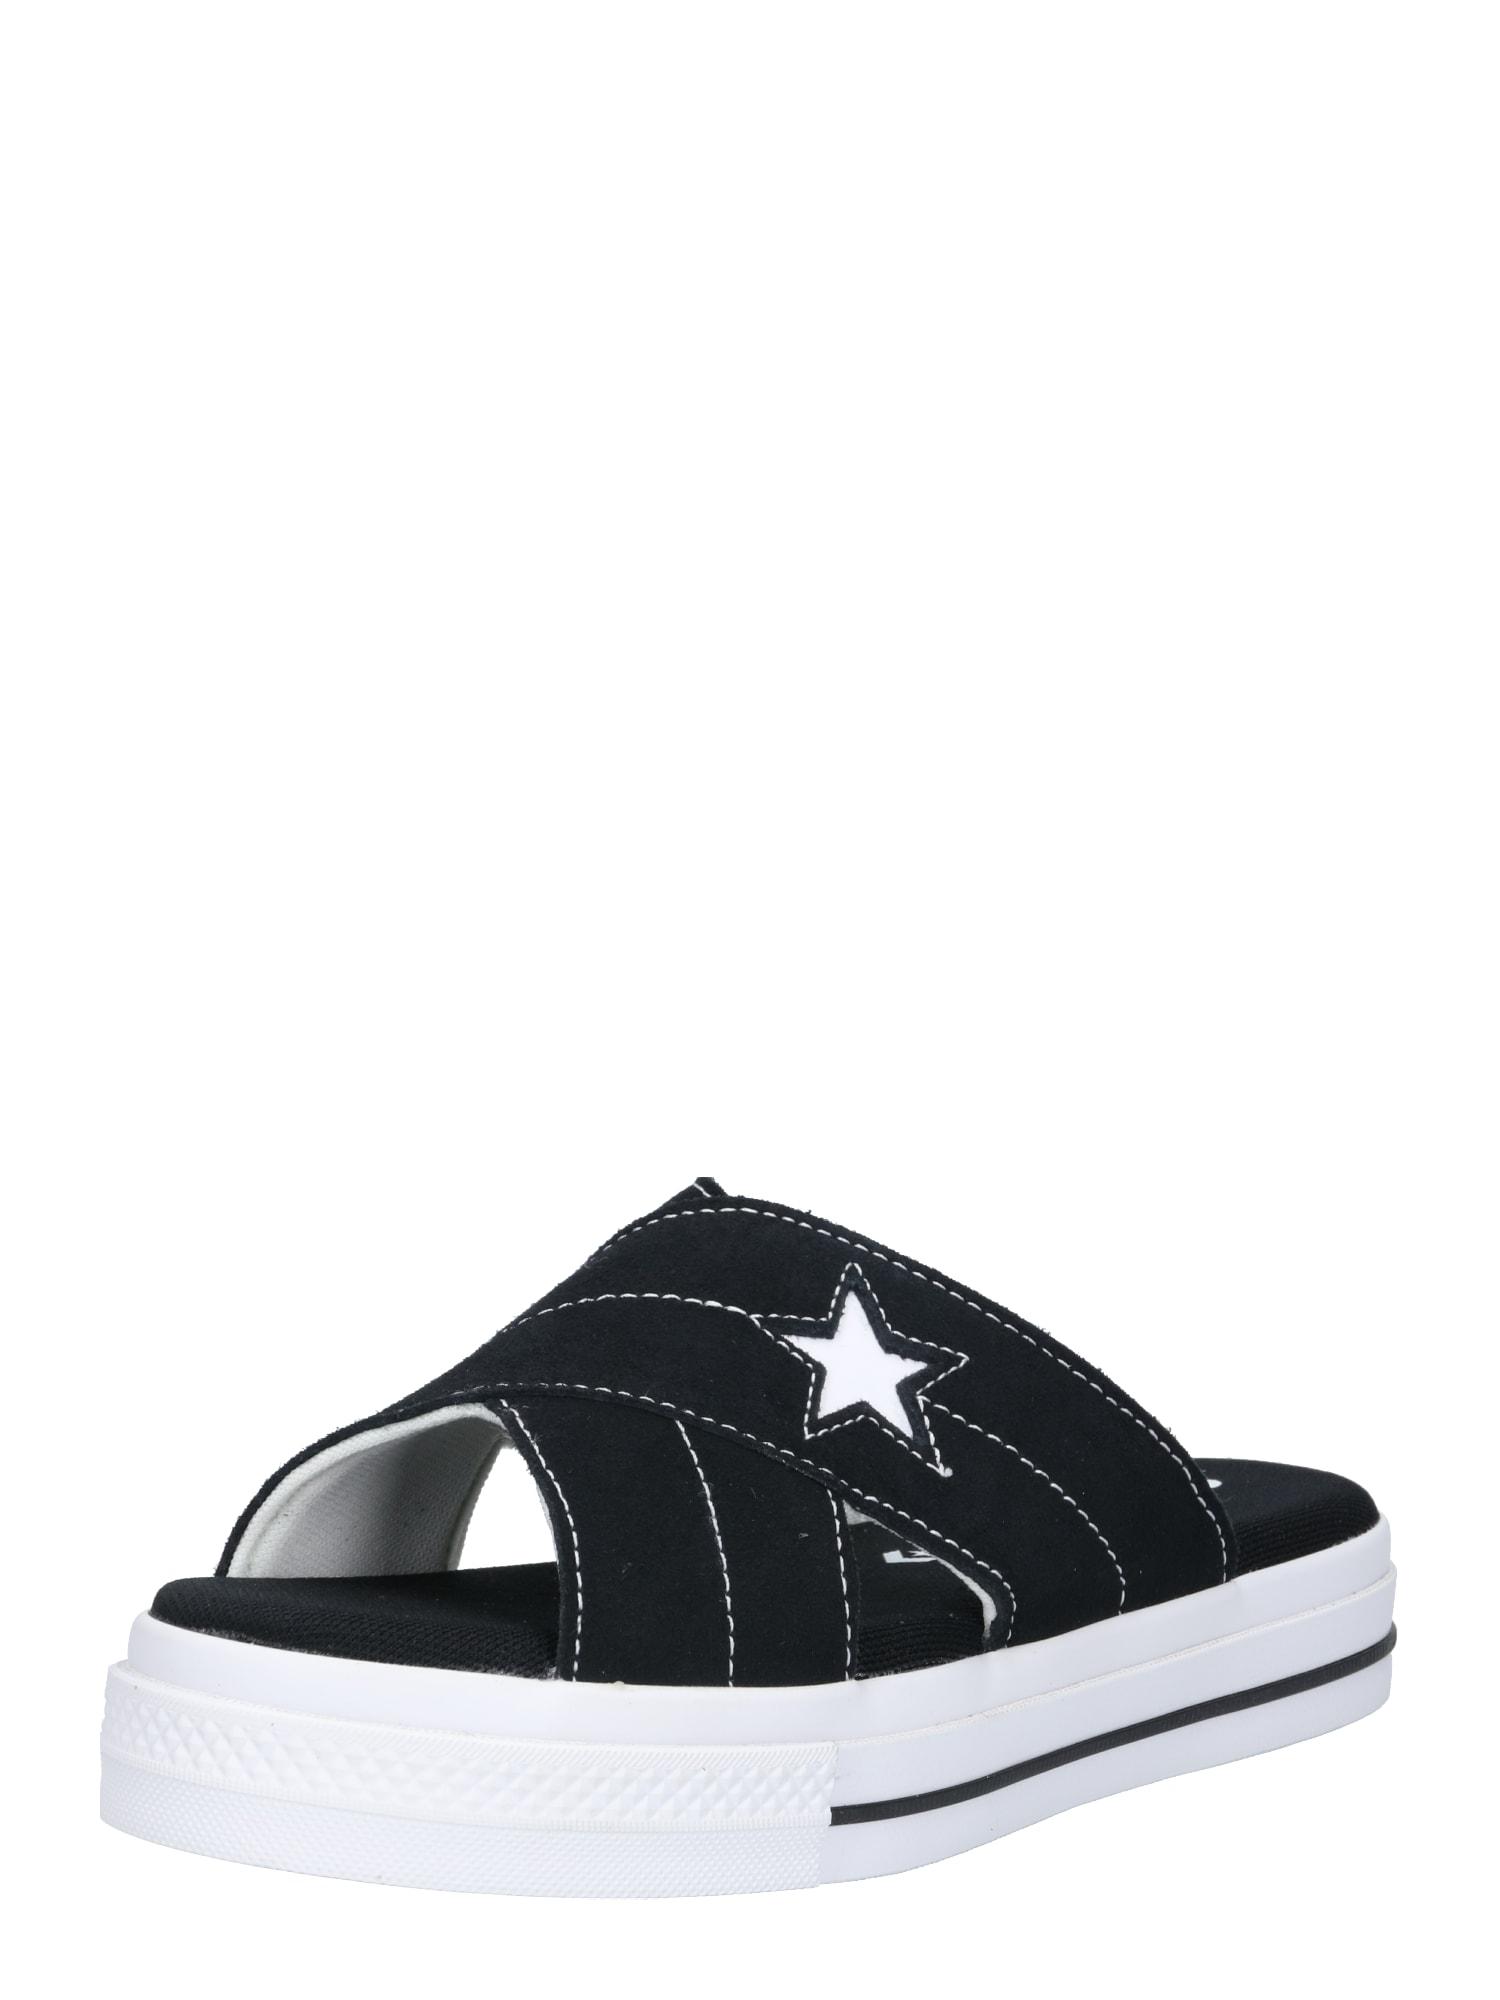 Pantofle One Star černá bílá CONVERSE